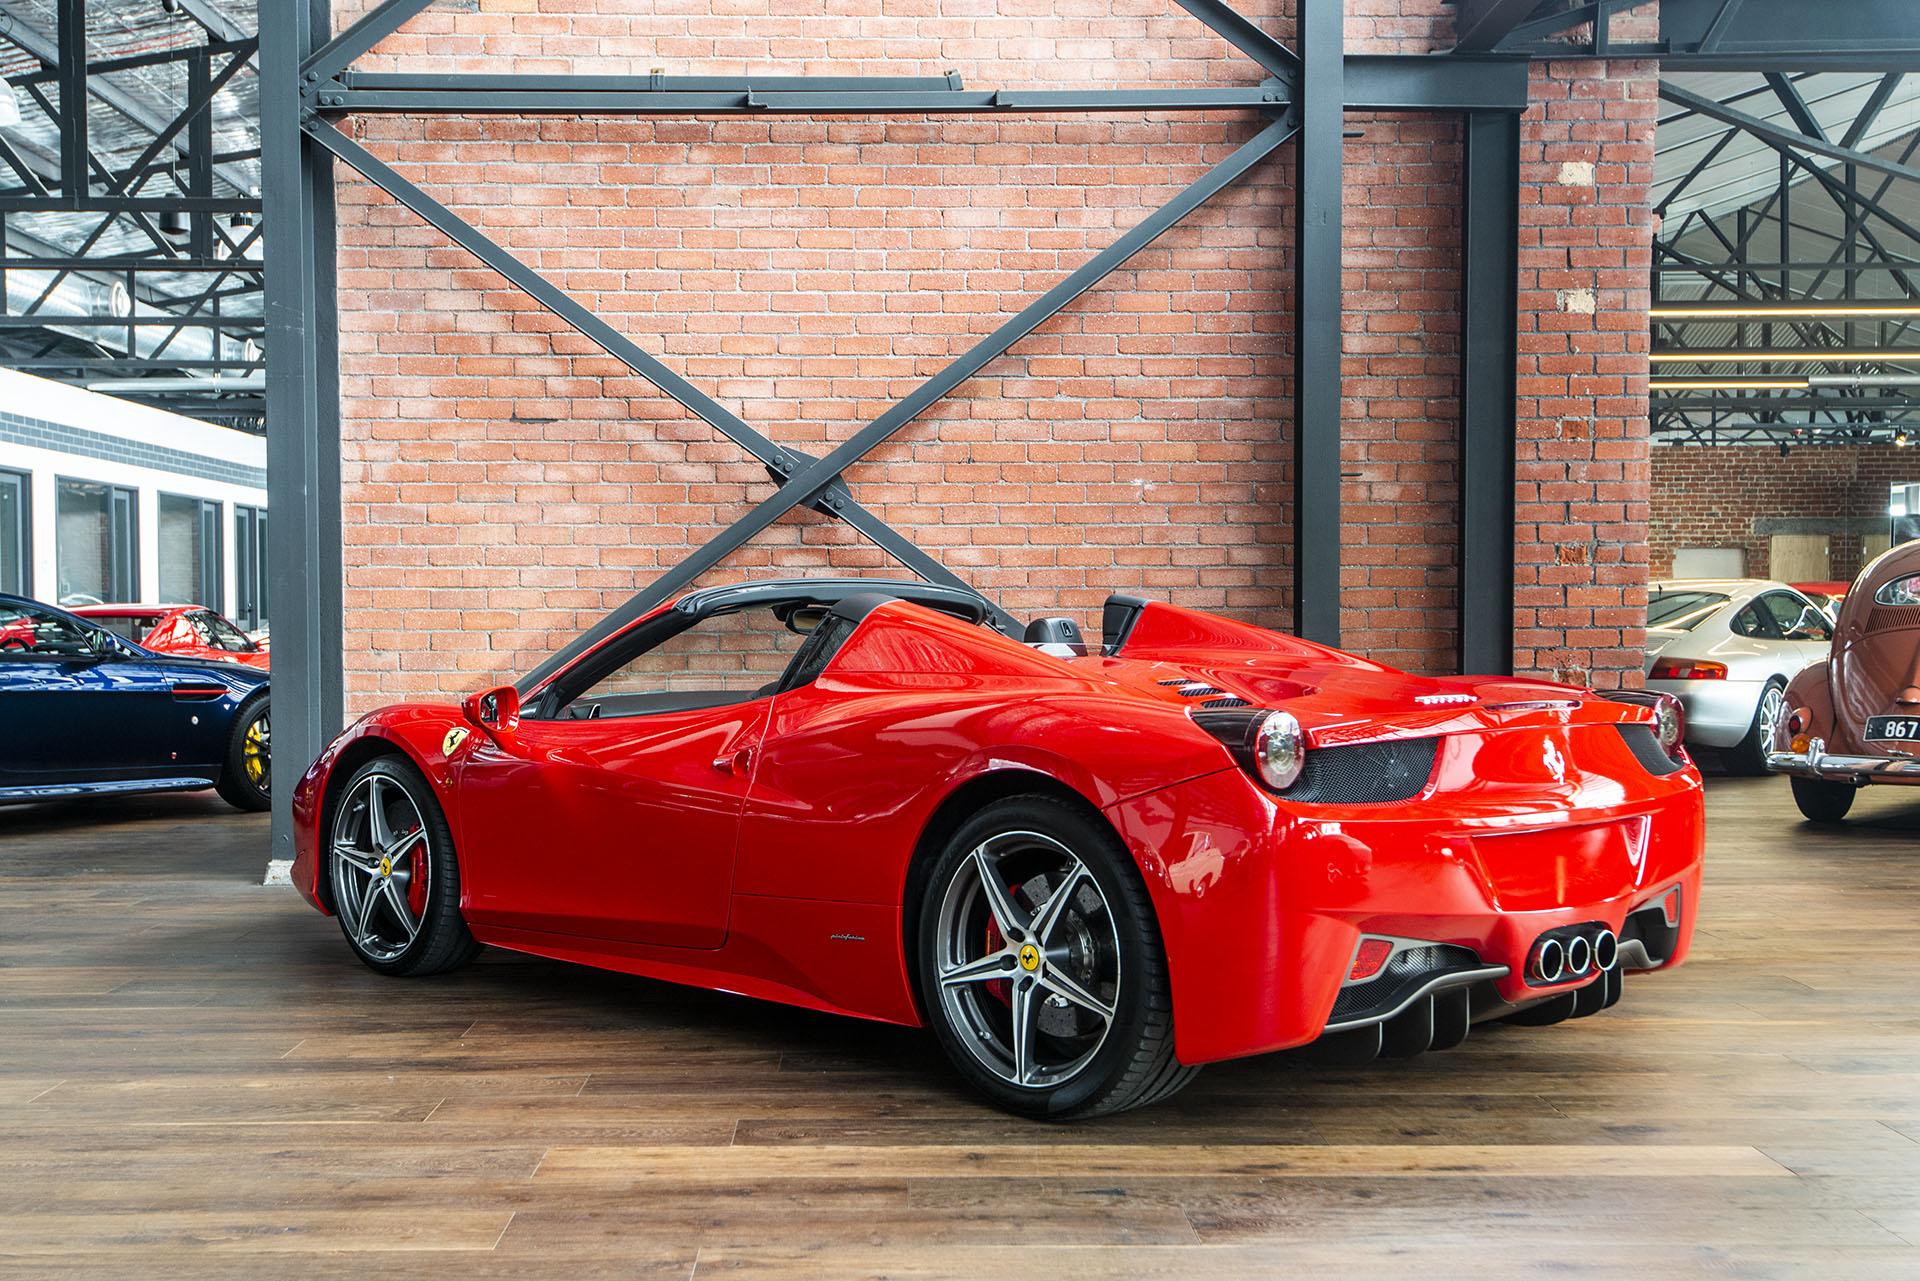 2013 Ferrari 458 Spider - Richmonds - Classic and Prestige ...  Ferrari 458 Spider Red